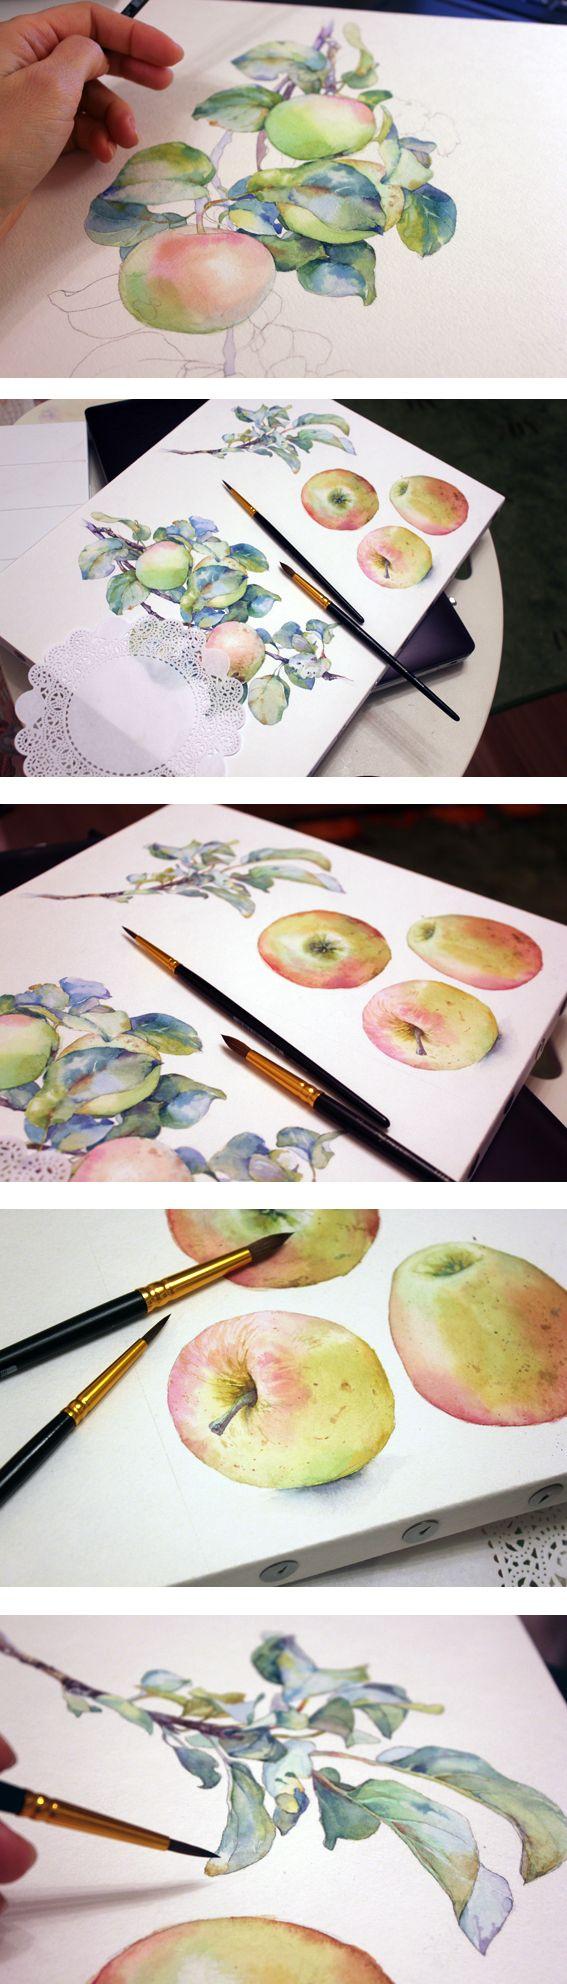 Apple wreath on Behance